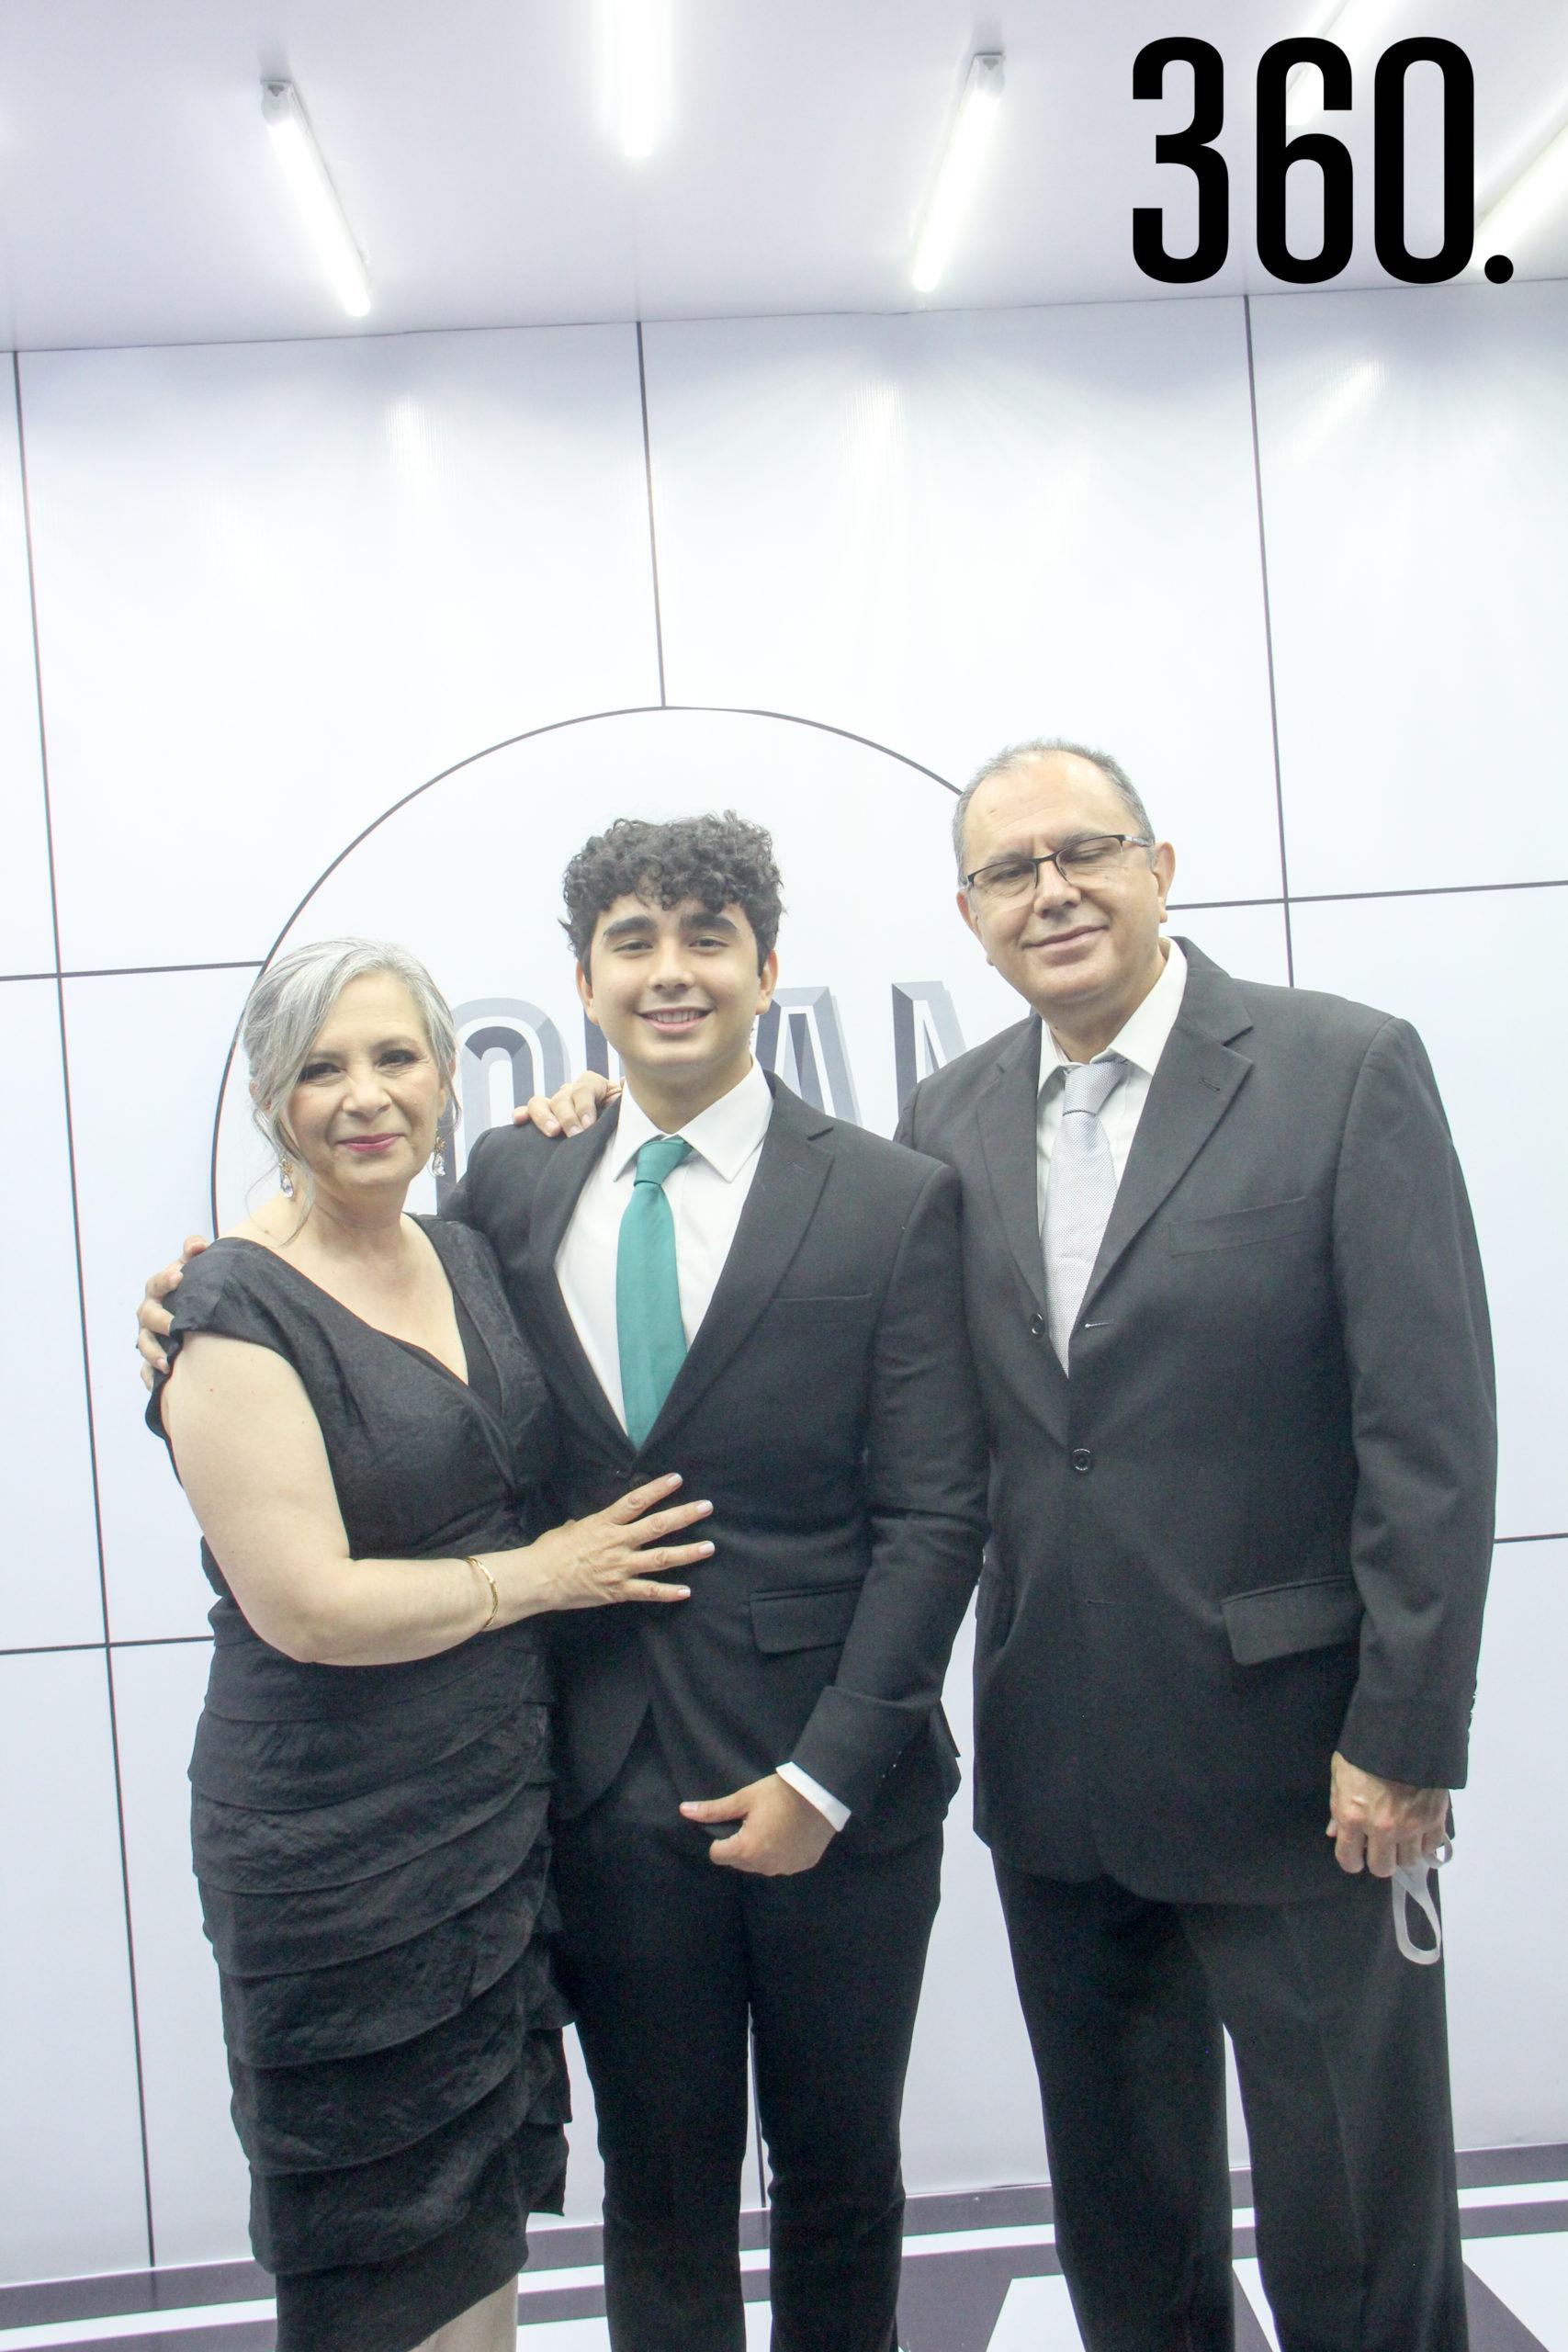 Edith Casim, Adán Díaz Nara y Adán Díaz.